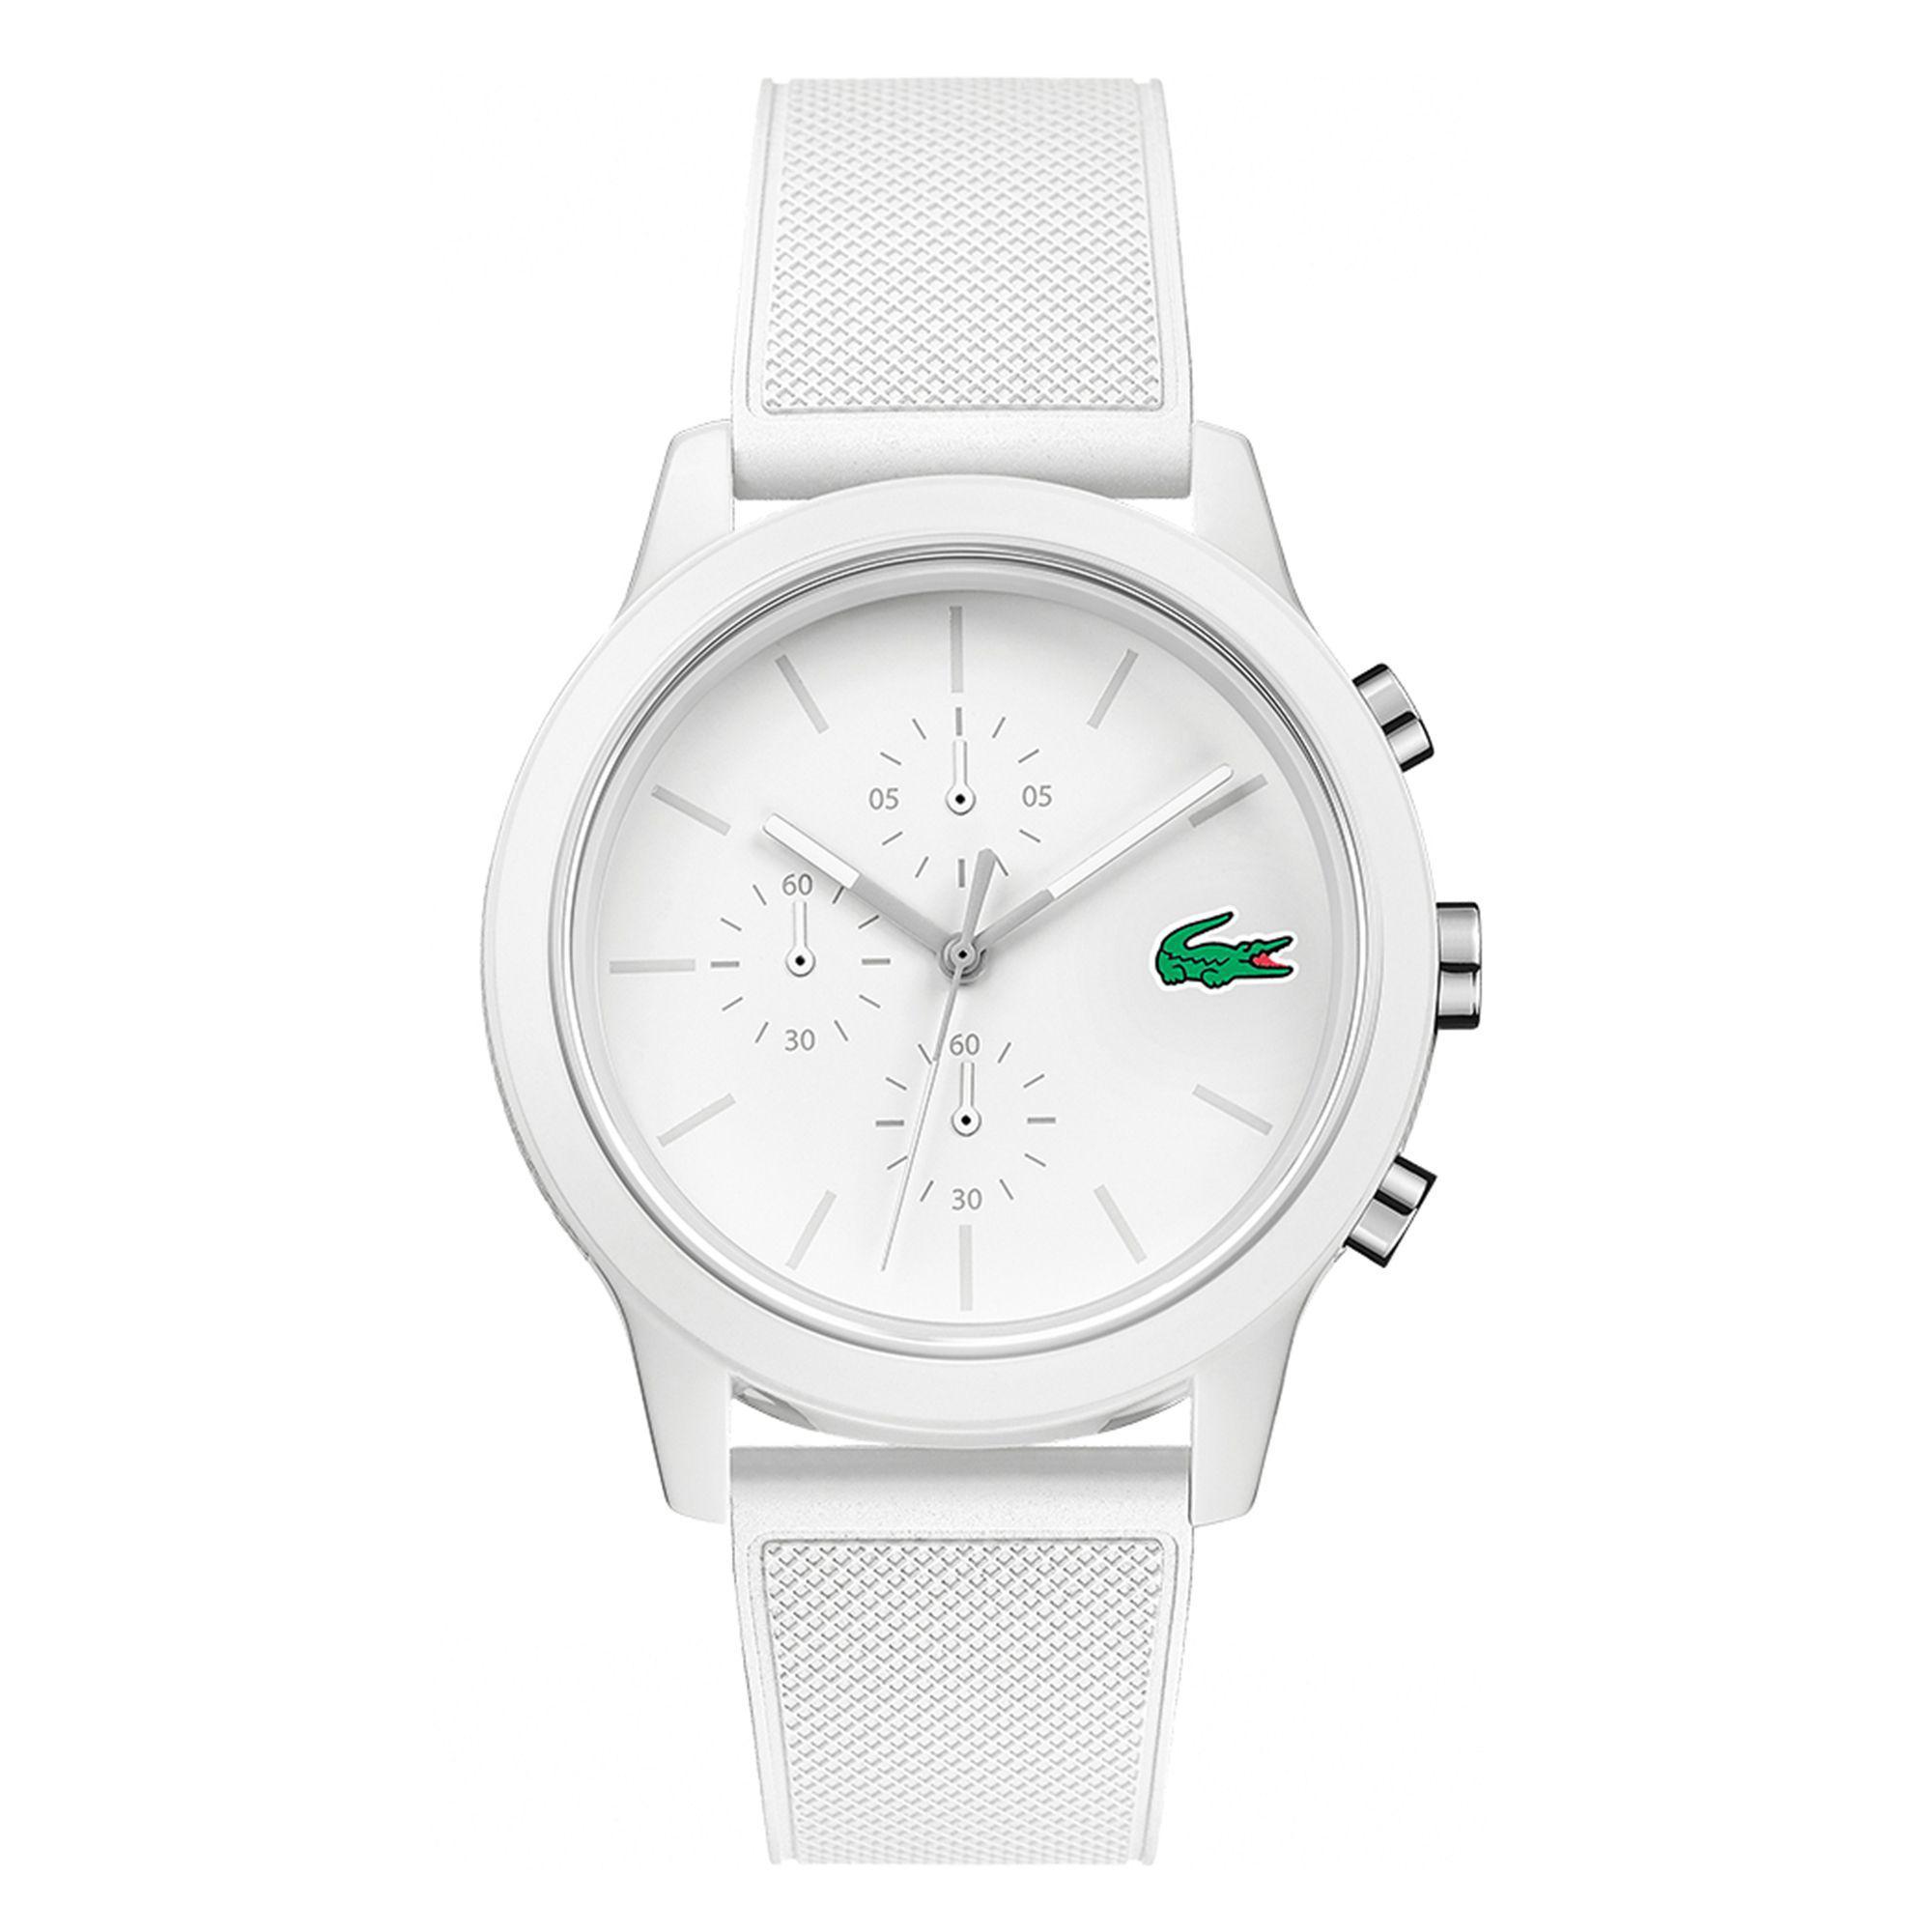 Lacoste. Men's White Chronograph Silicone Strap Watch